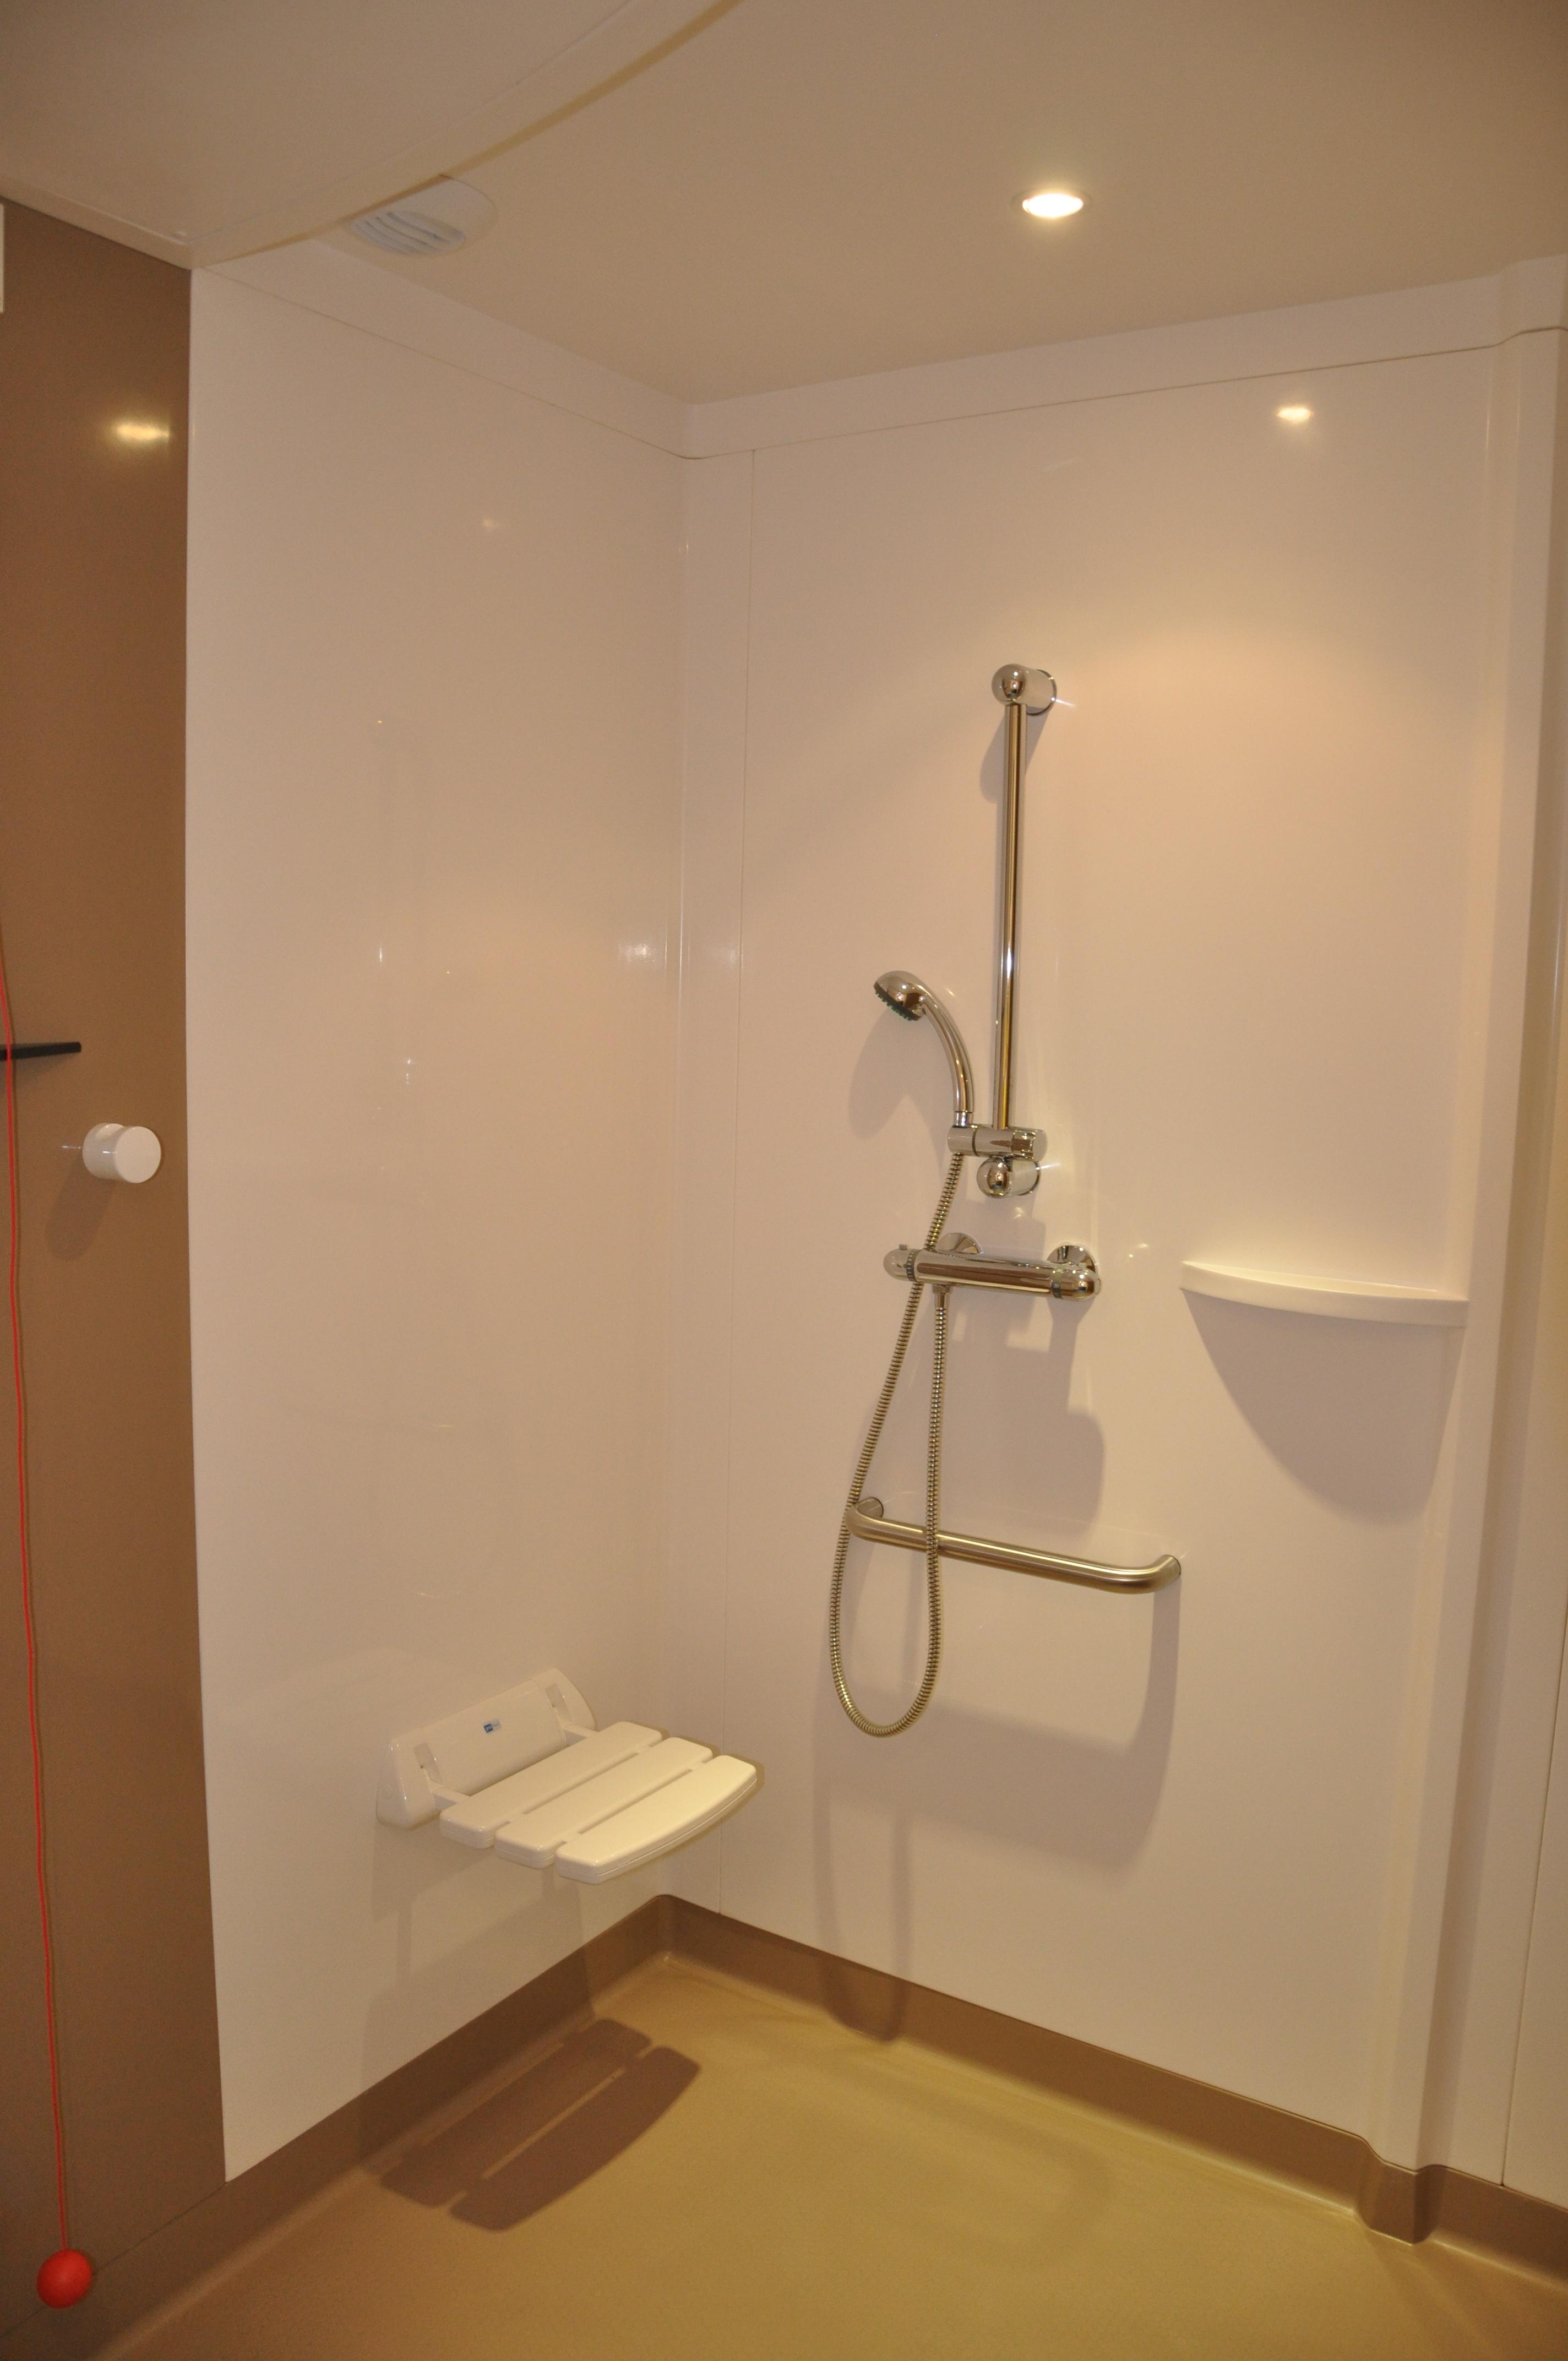 maison de retraite pr s de palavas occitane r sidence. Black Bedroom Furniture Sets. Home Design Ideas